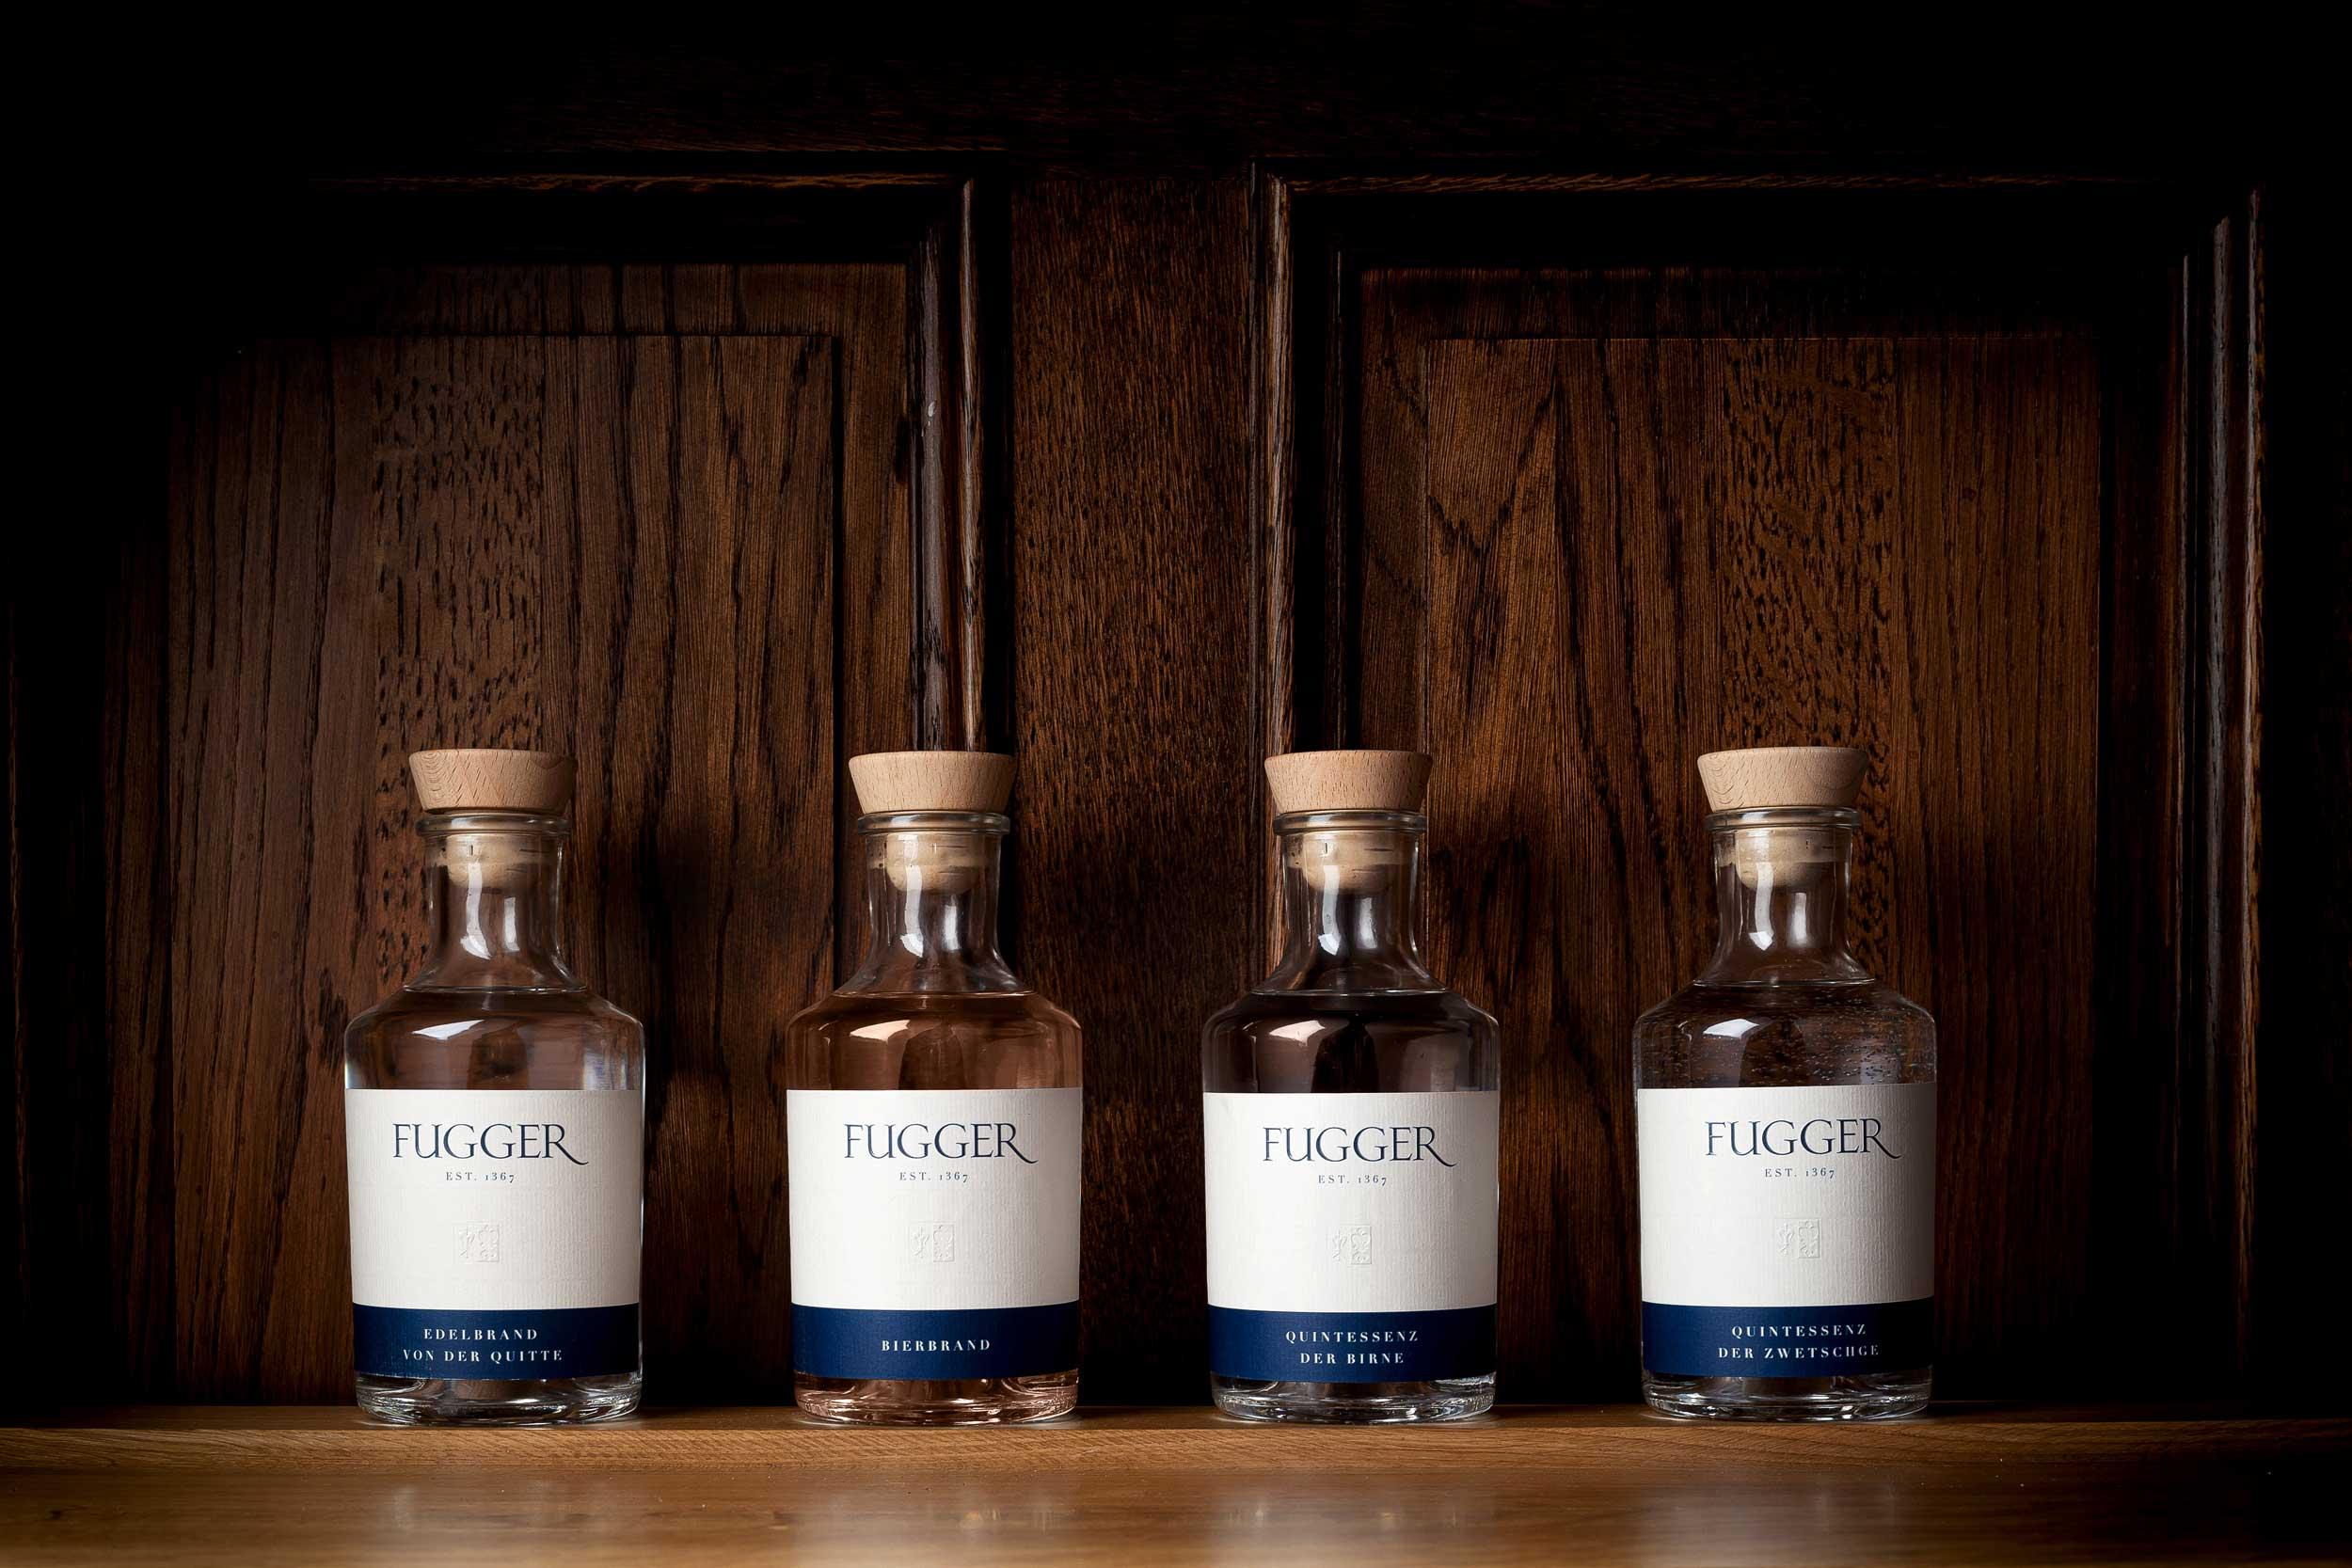 Die Fugger Destillate